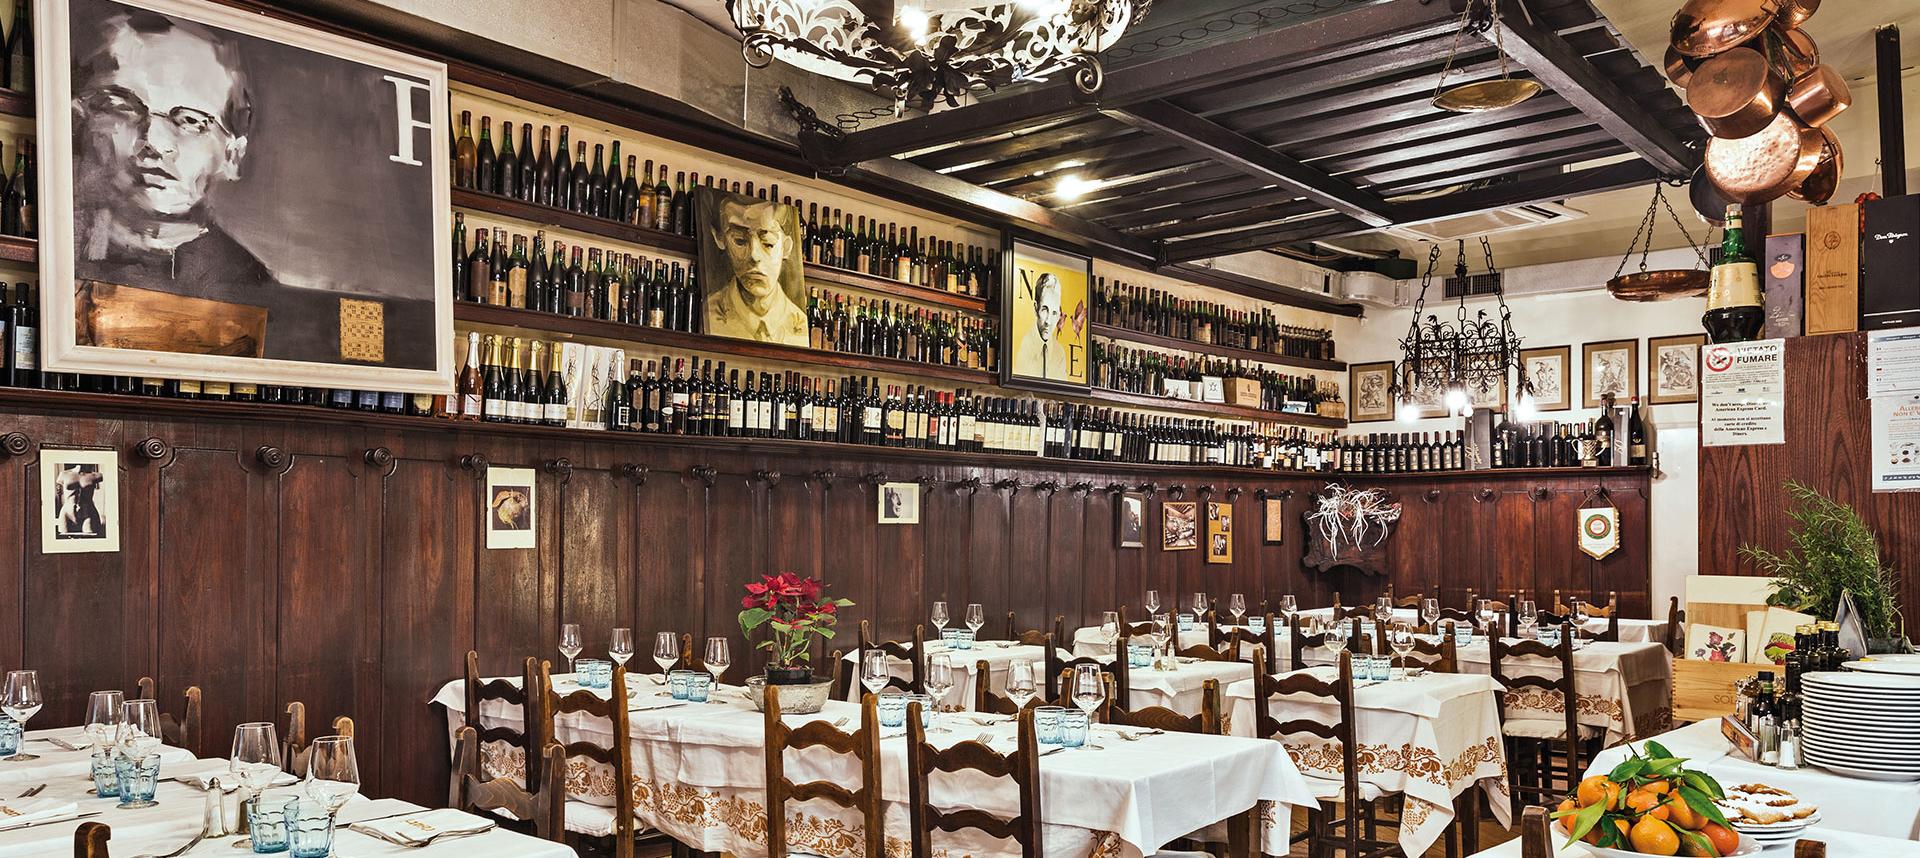 ristorante-da-cesari-interno-ingresso